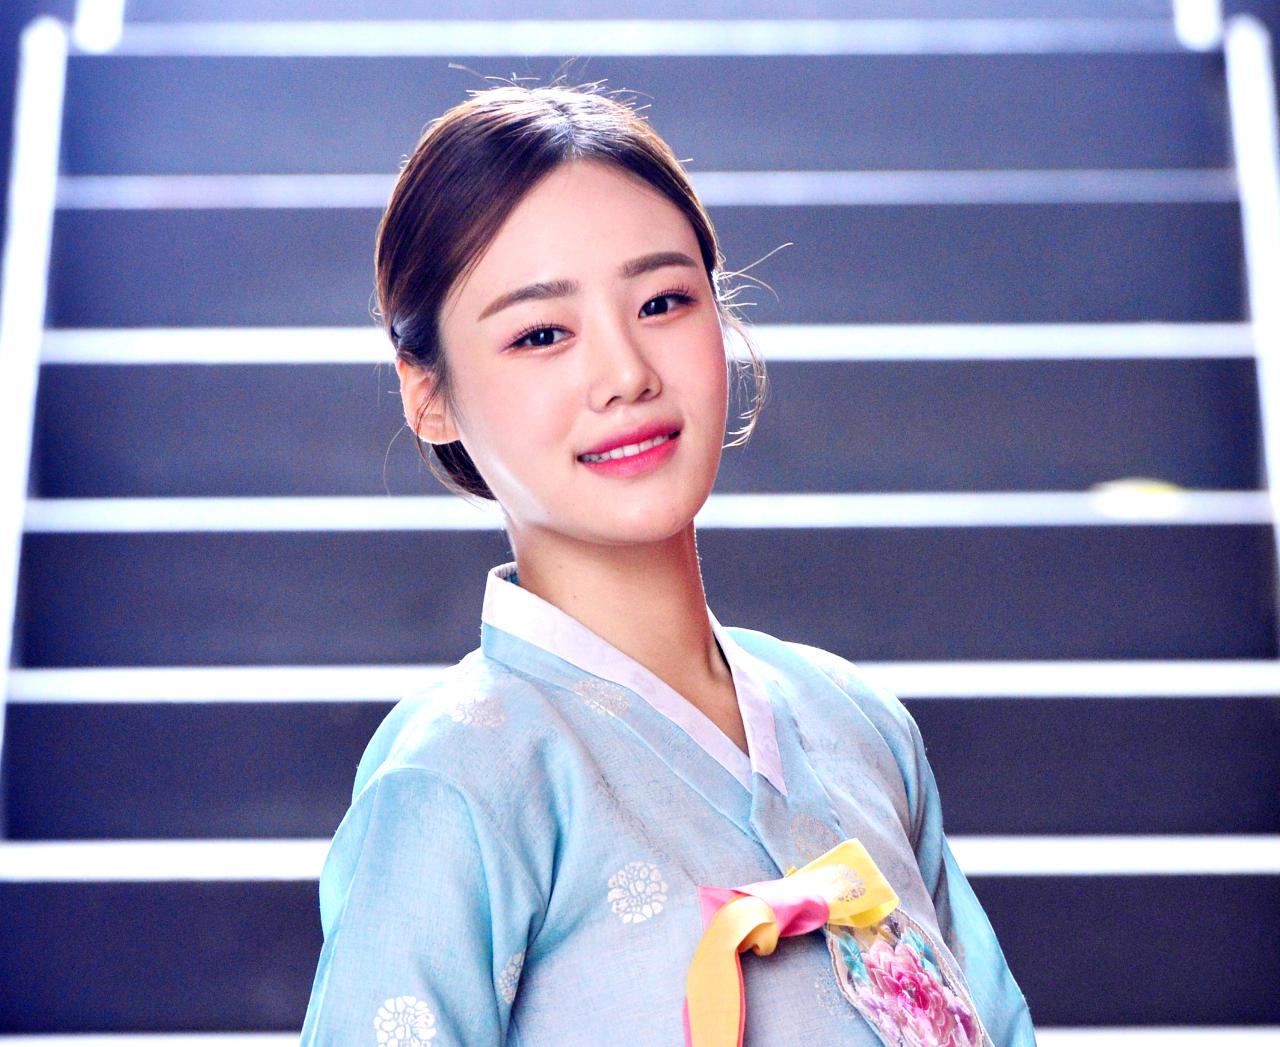 Kim Min-seol, winner of this year's Miss Chunhyang beauty pageant (Park Hyun-koo/The Korea Herald)